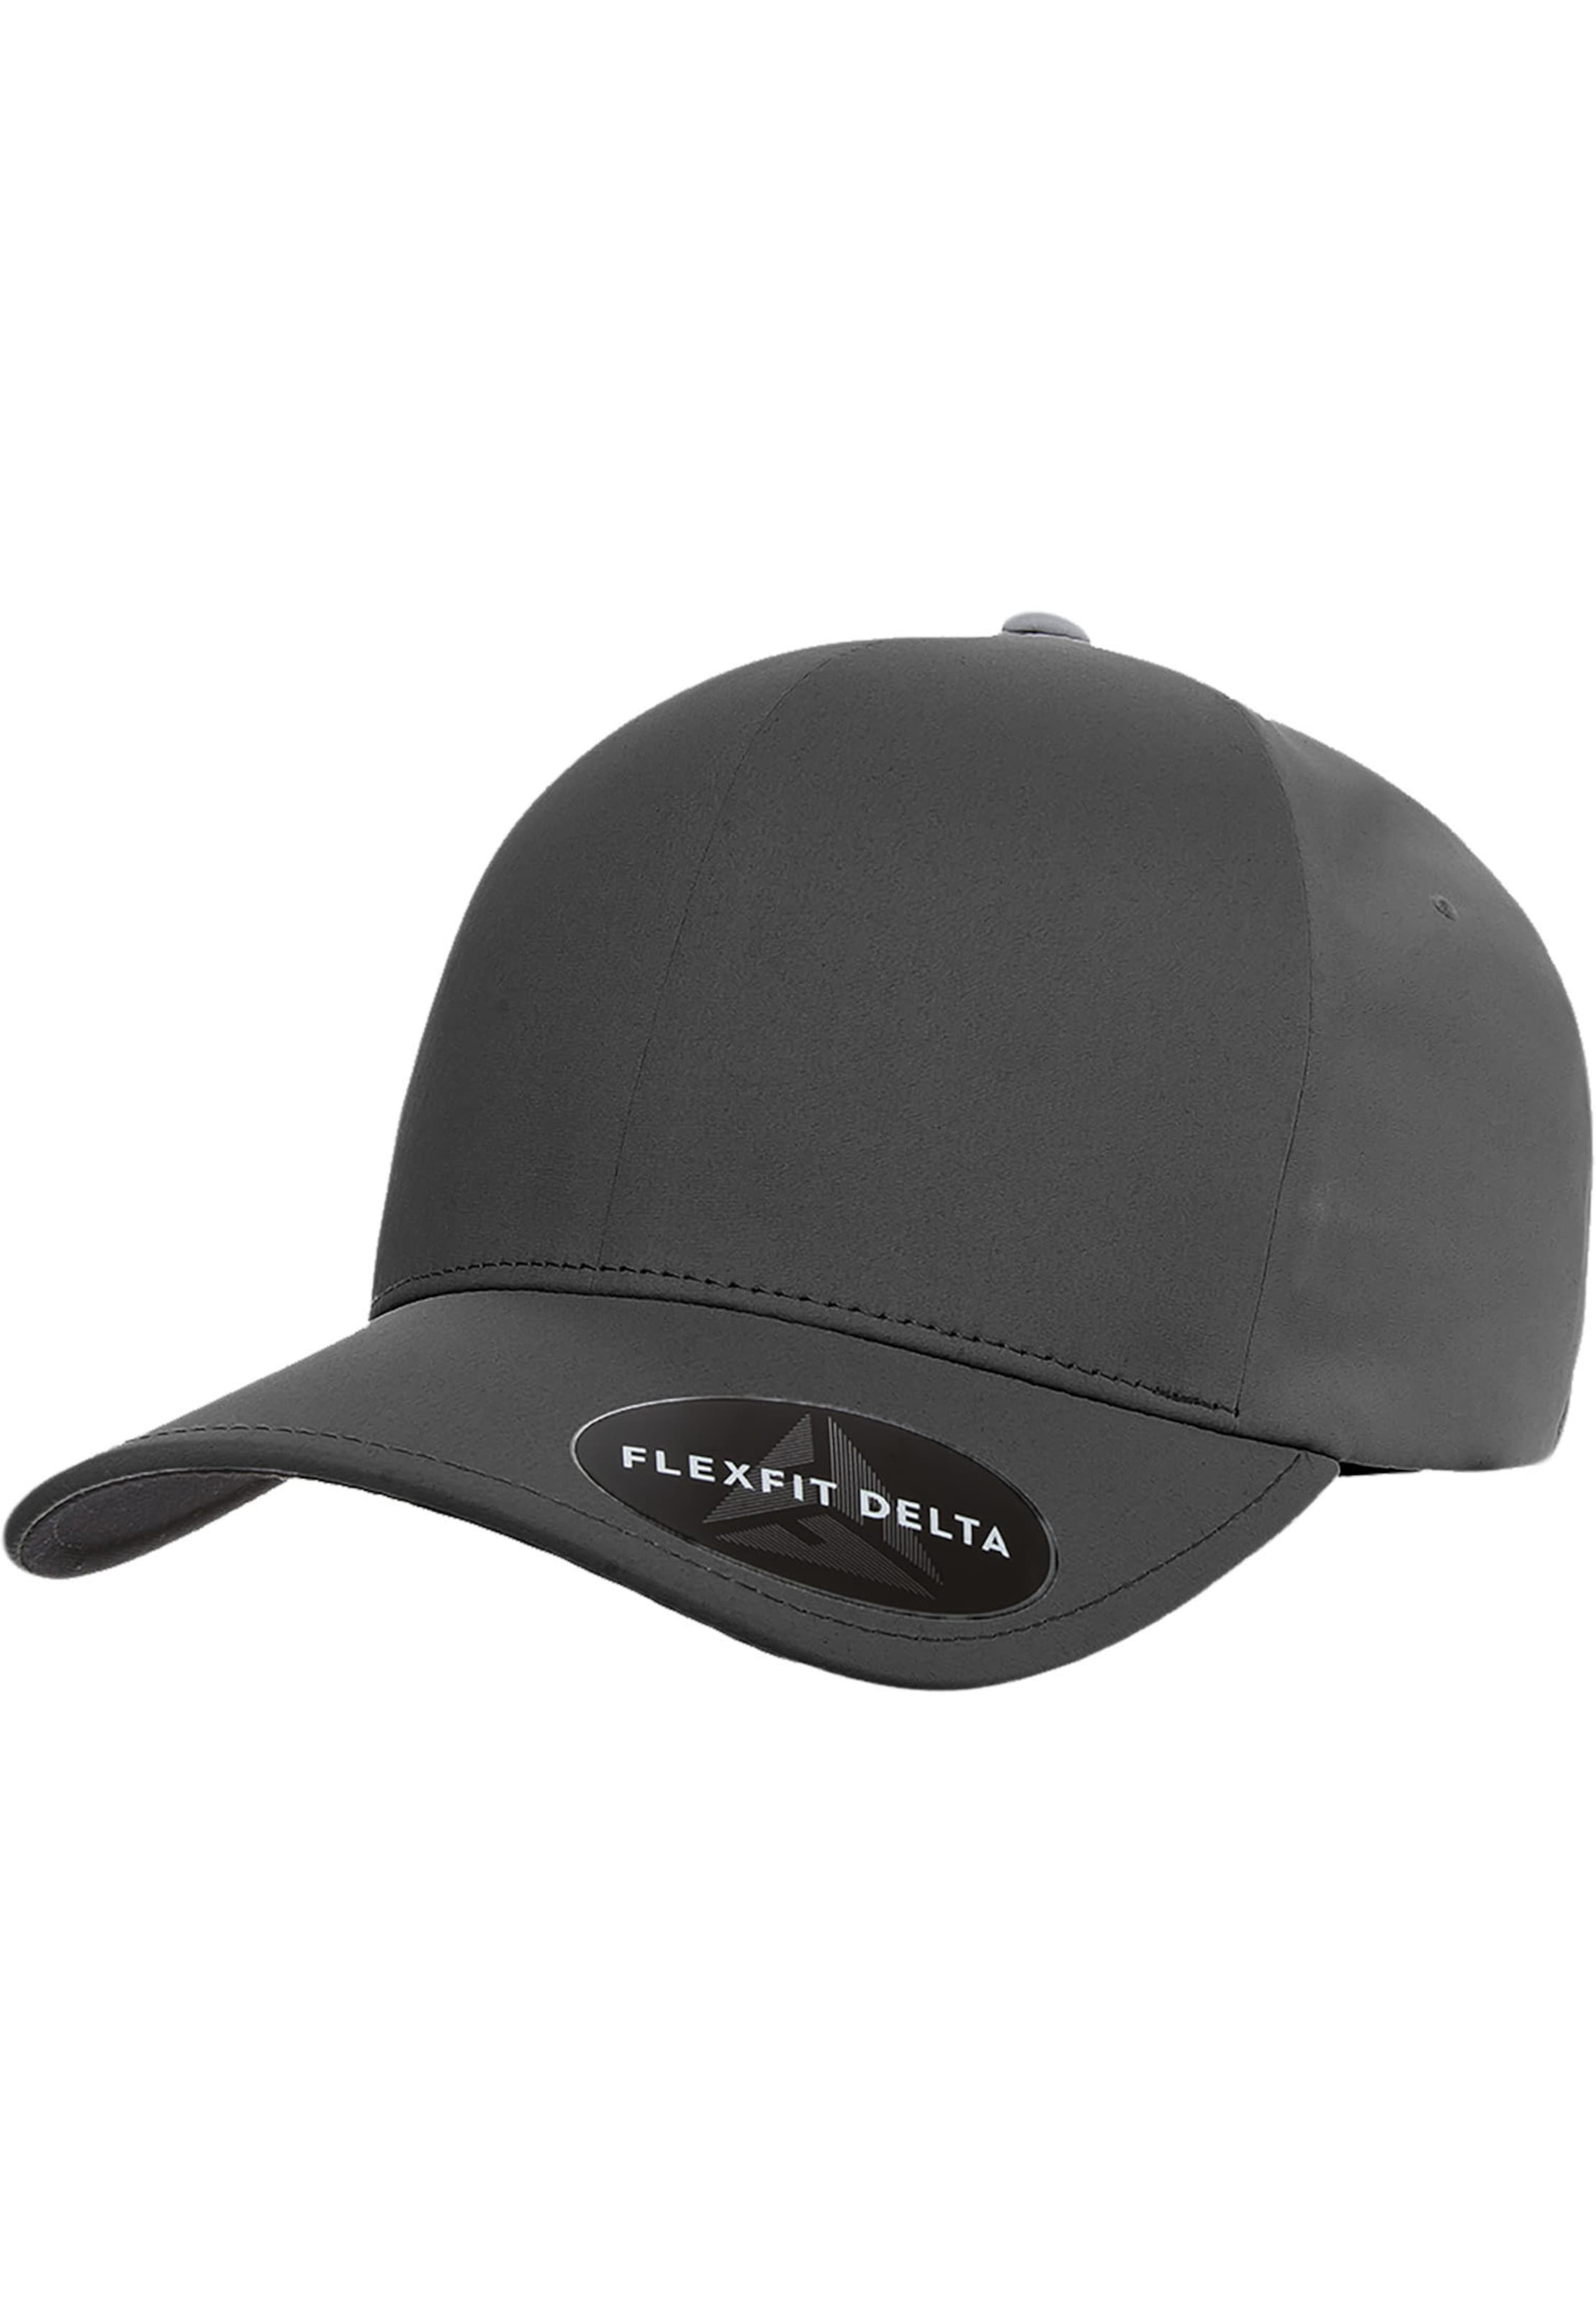 Cap Cap 'delta' Dunkelgrau In Flexfit In Flexfit 'delta' rhQxsdtC